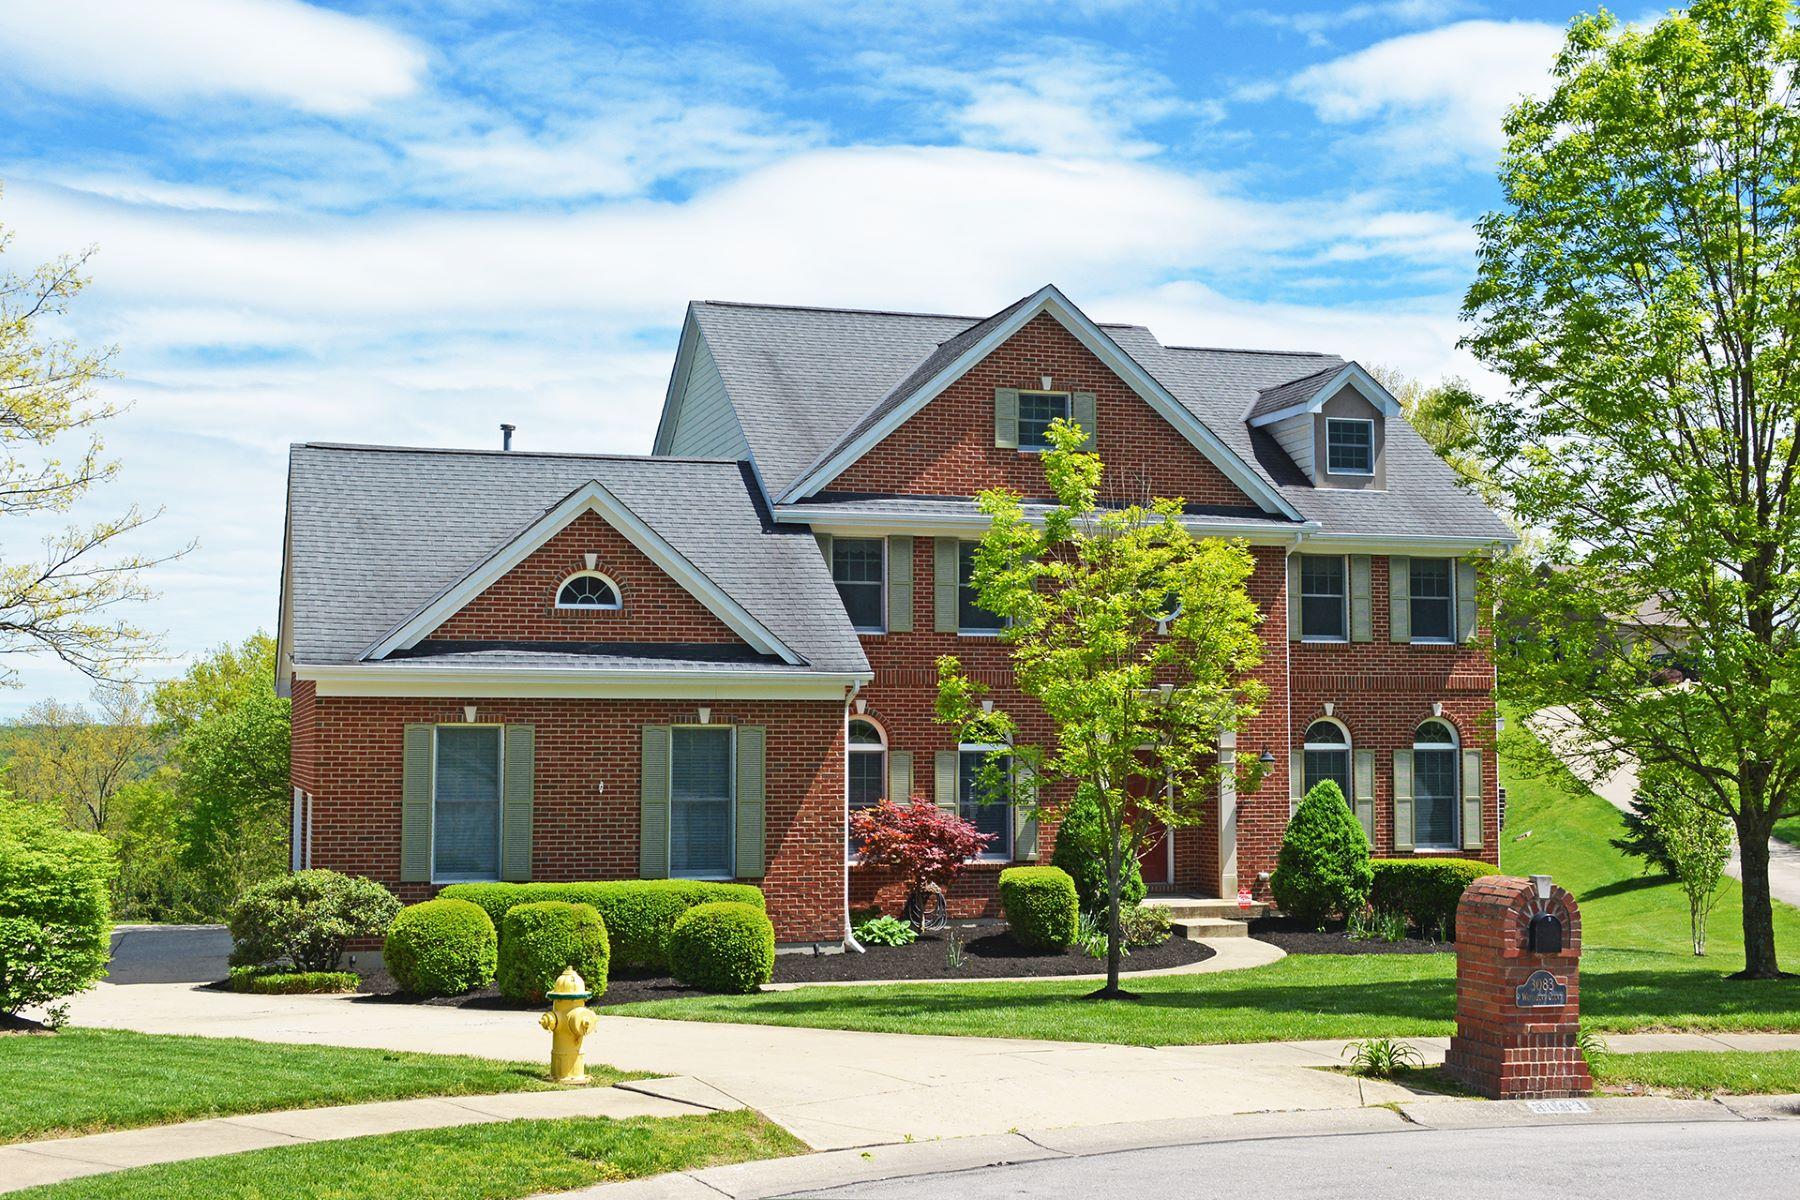 Casa Unifamiliar por un Venta en Fabulous custom built home. 3083 Waterbury Court Edgewood, Kentucky 41017 Estados Unidos